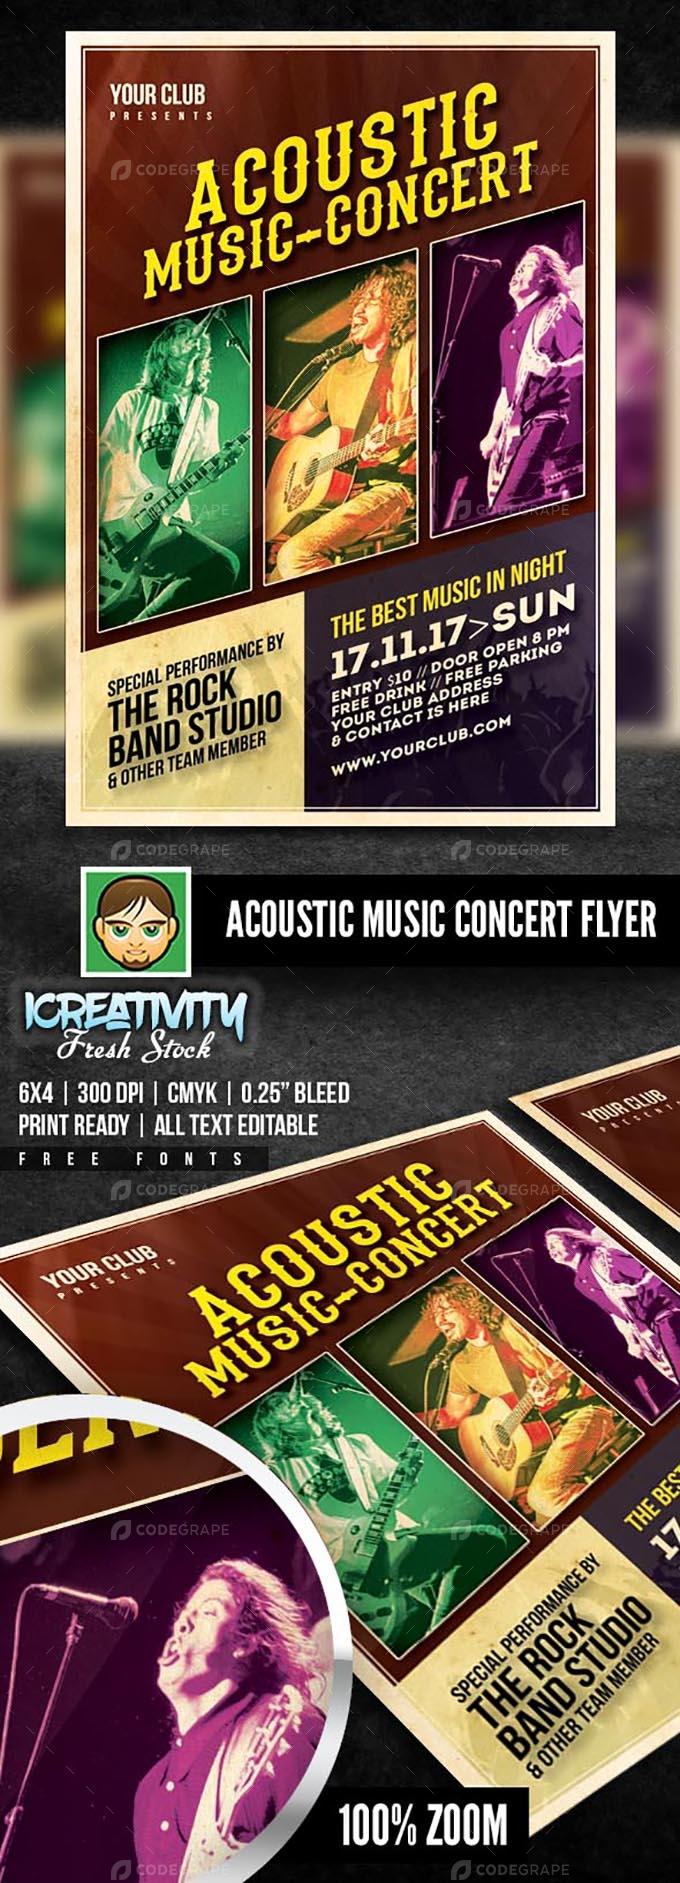 Acoustic Music Concert Flyer